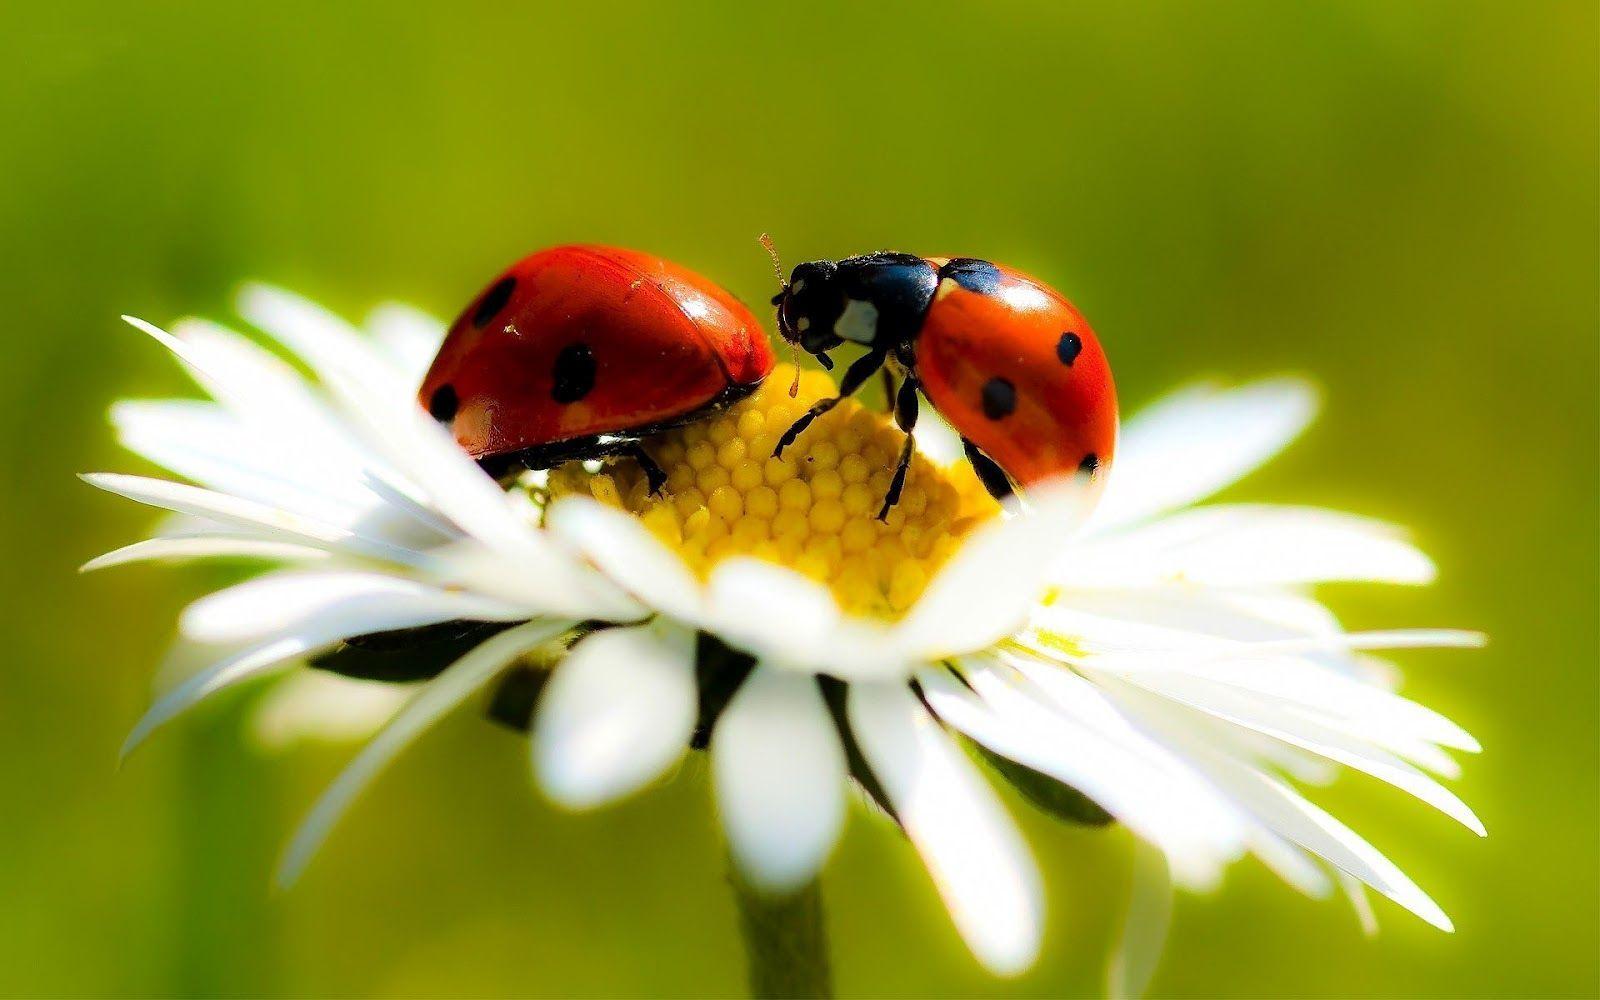 images of ladybugs   hd-ladybug-wallpaper-with-two-ladybugs-on-a